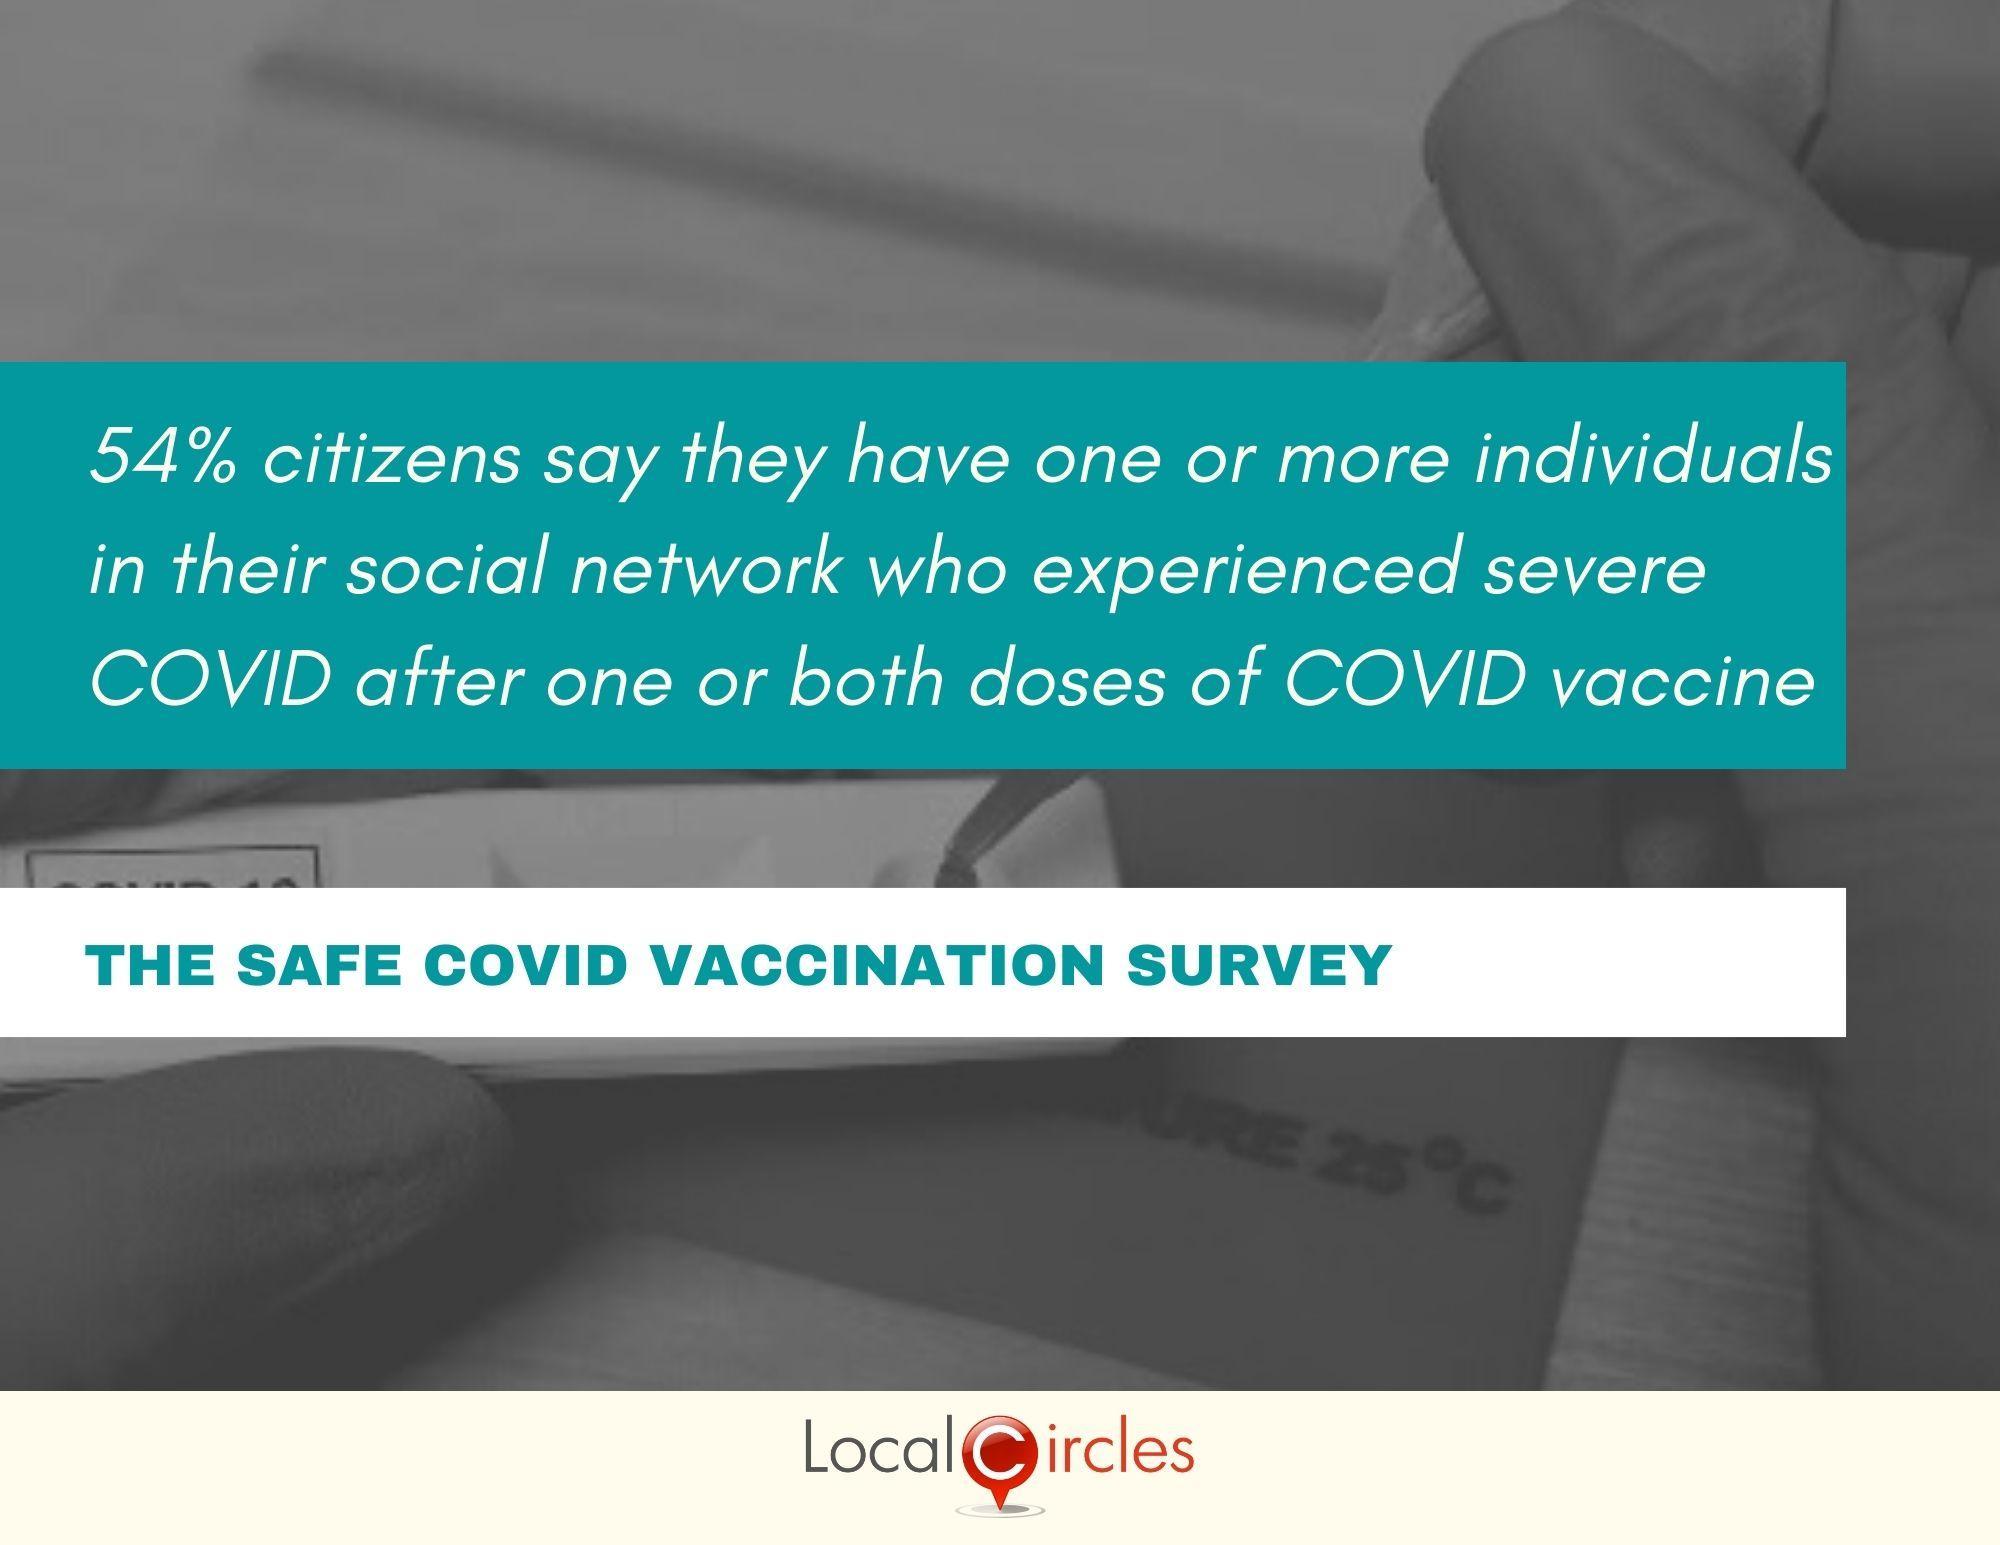 via_LocalCircles_COVID_Vaccine_2___20210517121519___.jpg